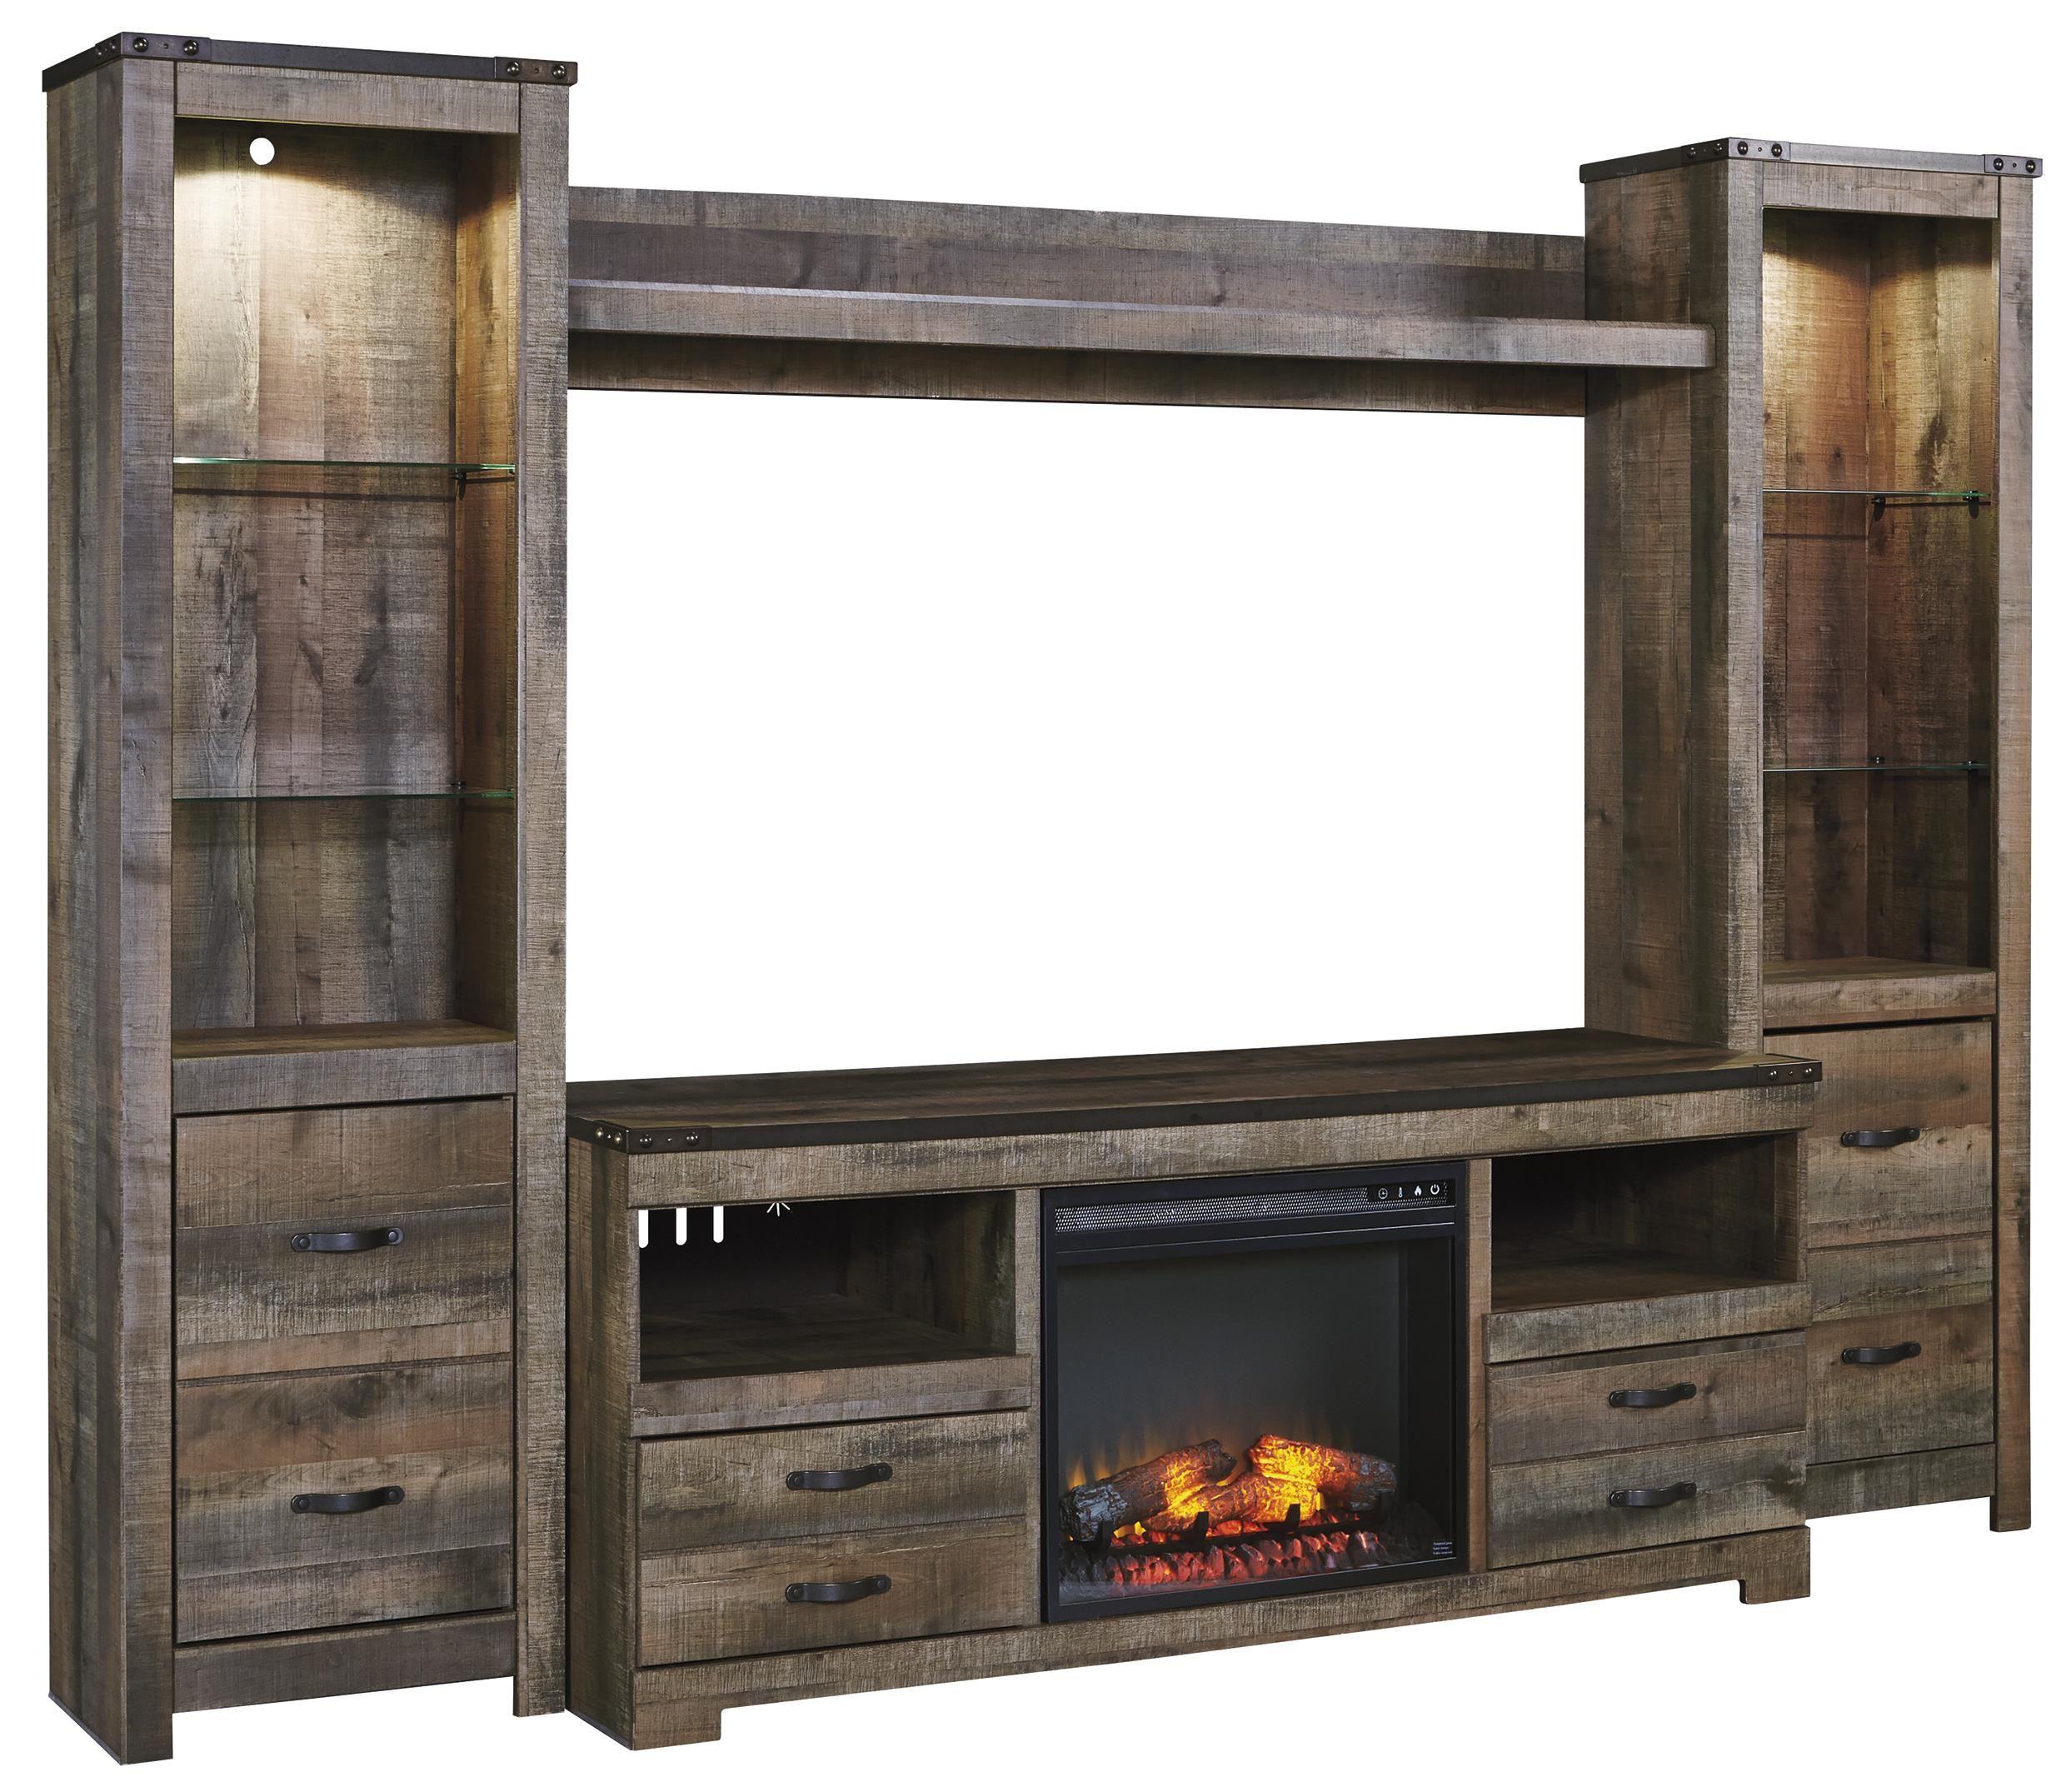 Ashley Furniture Corporate Number Plans Inspiration Decorating Design